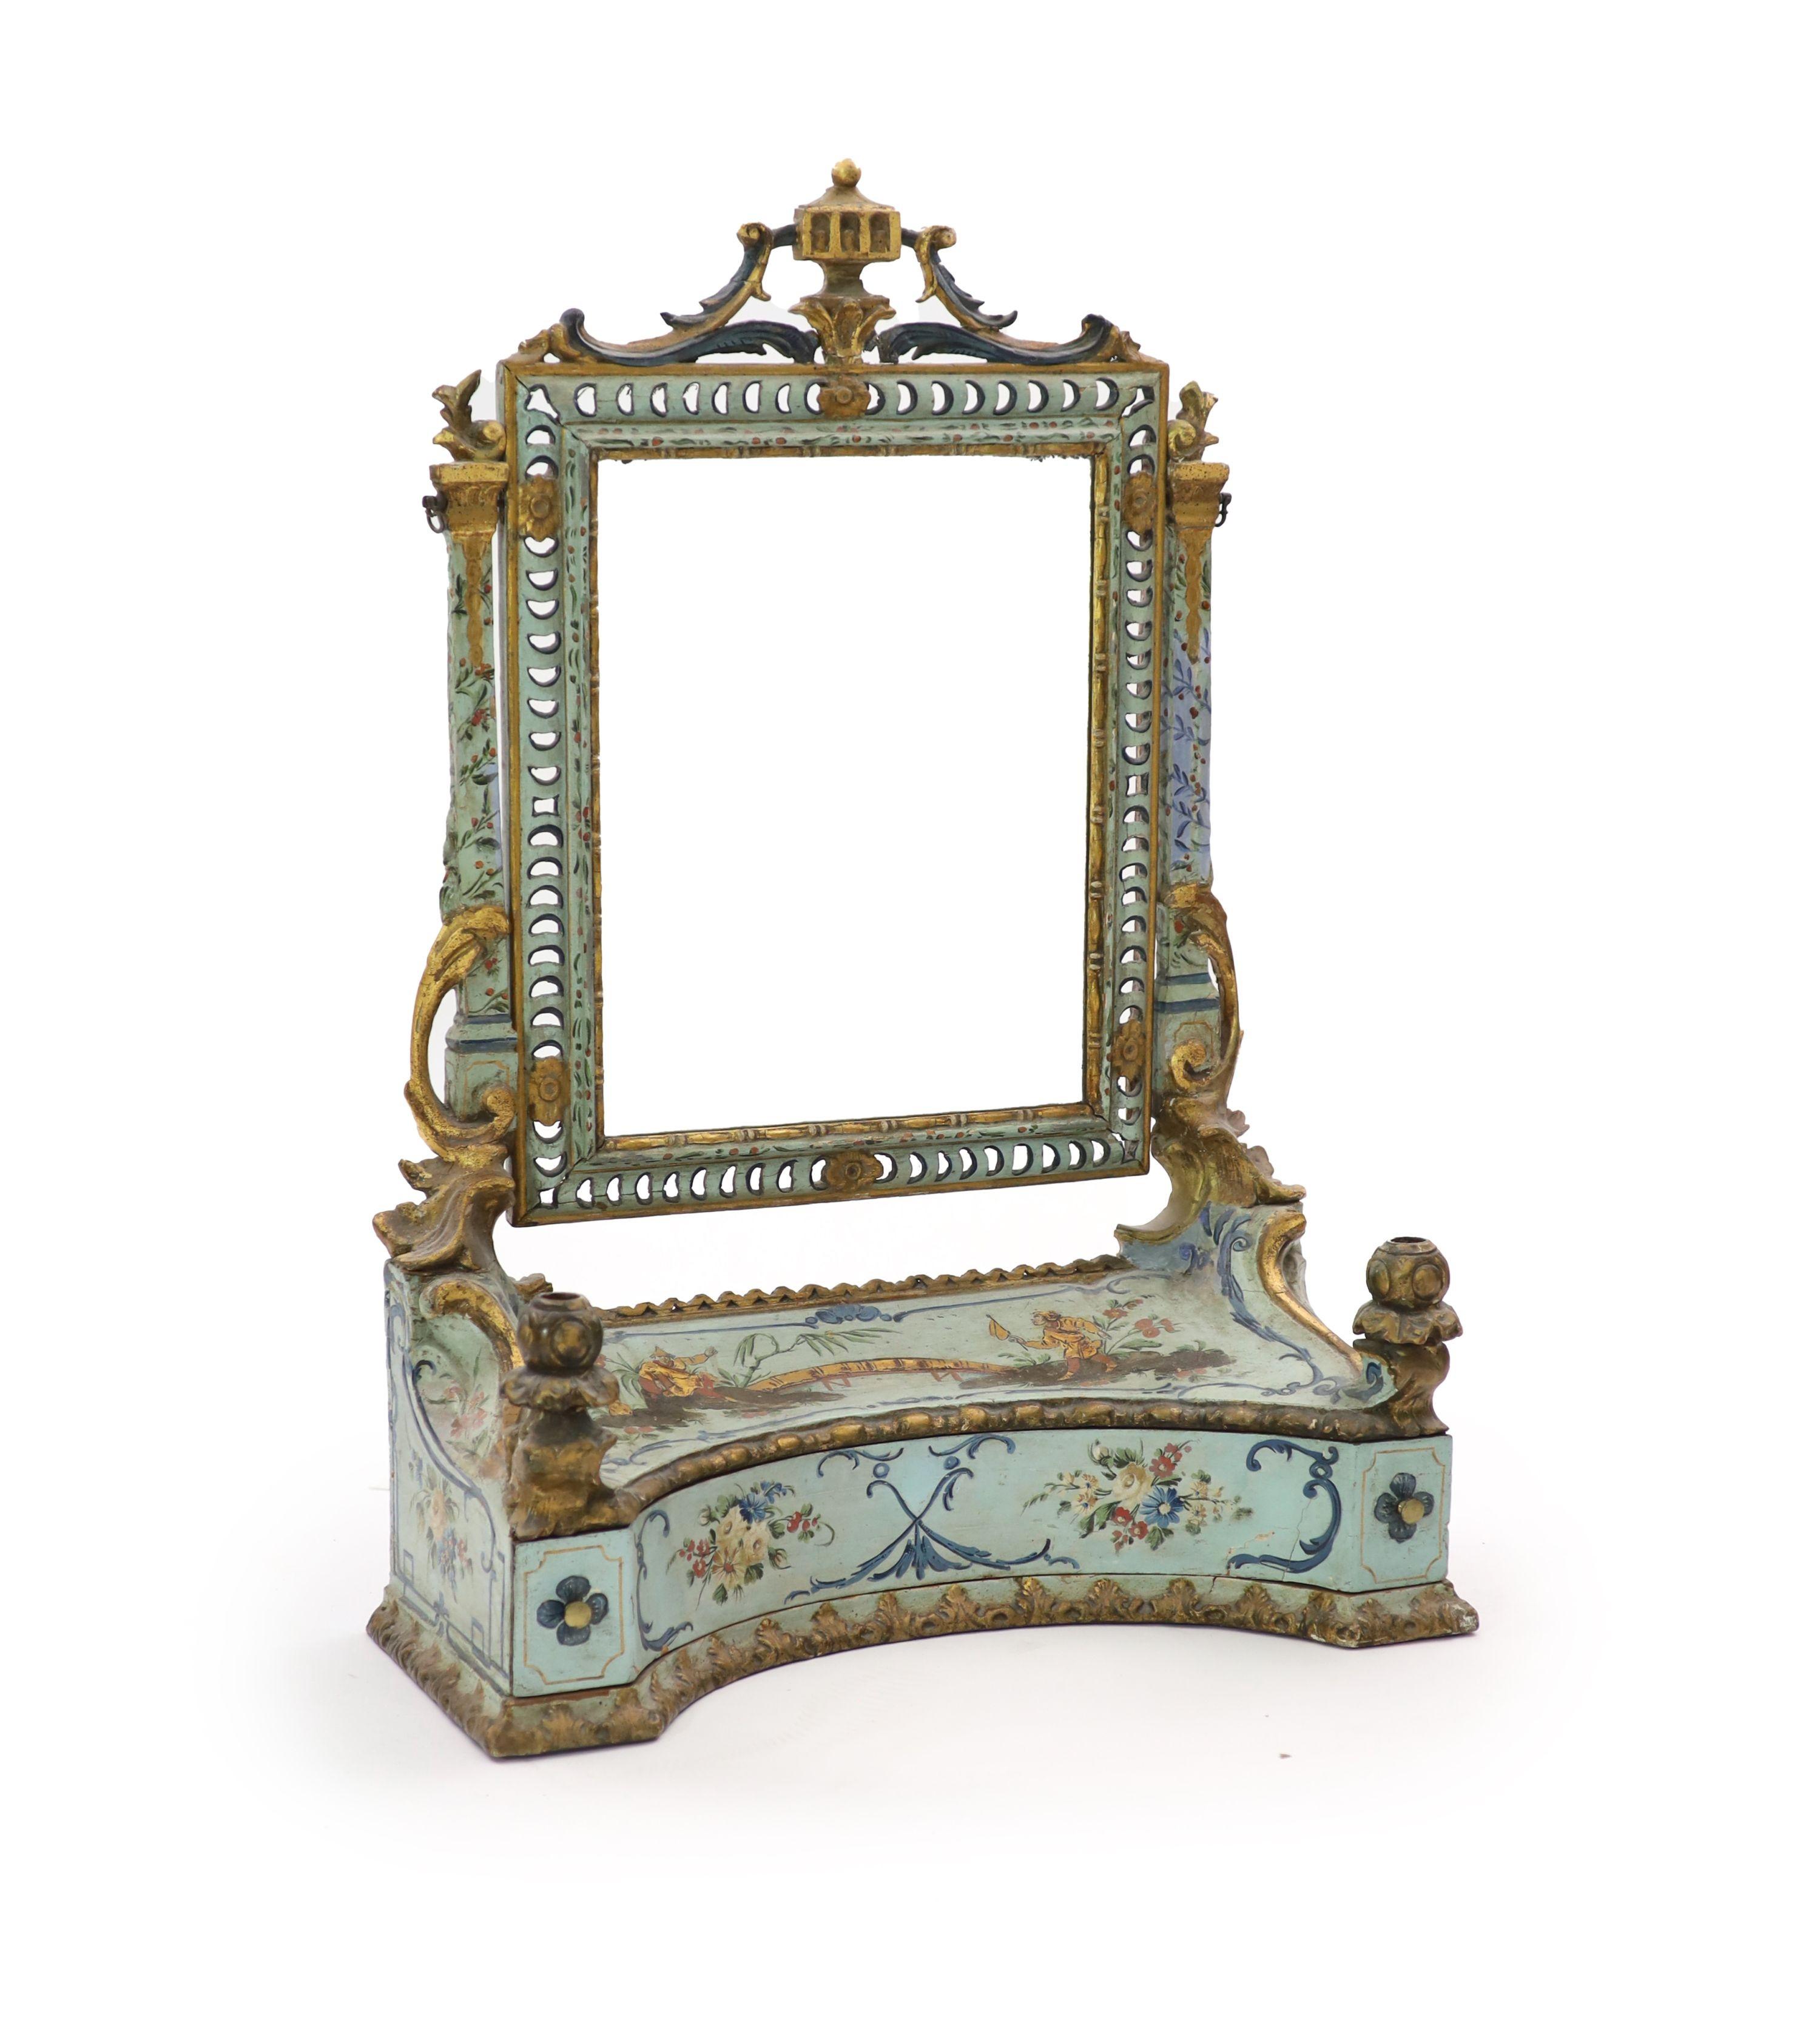 An 18th century Venetian painted pine toilet mirror